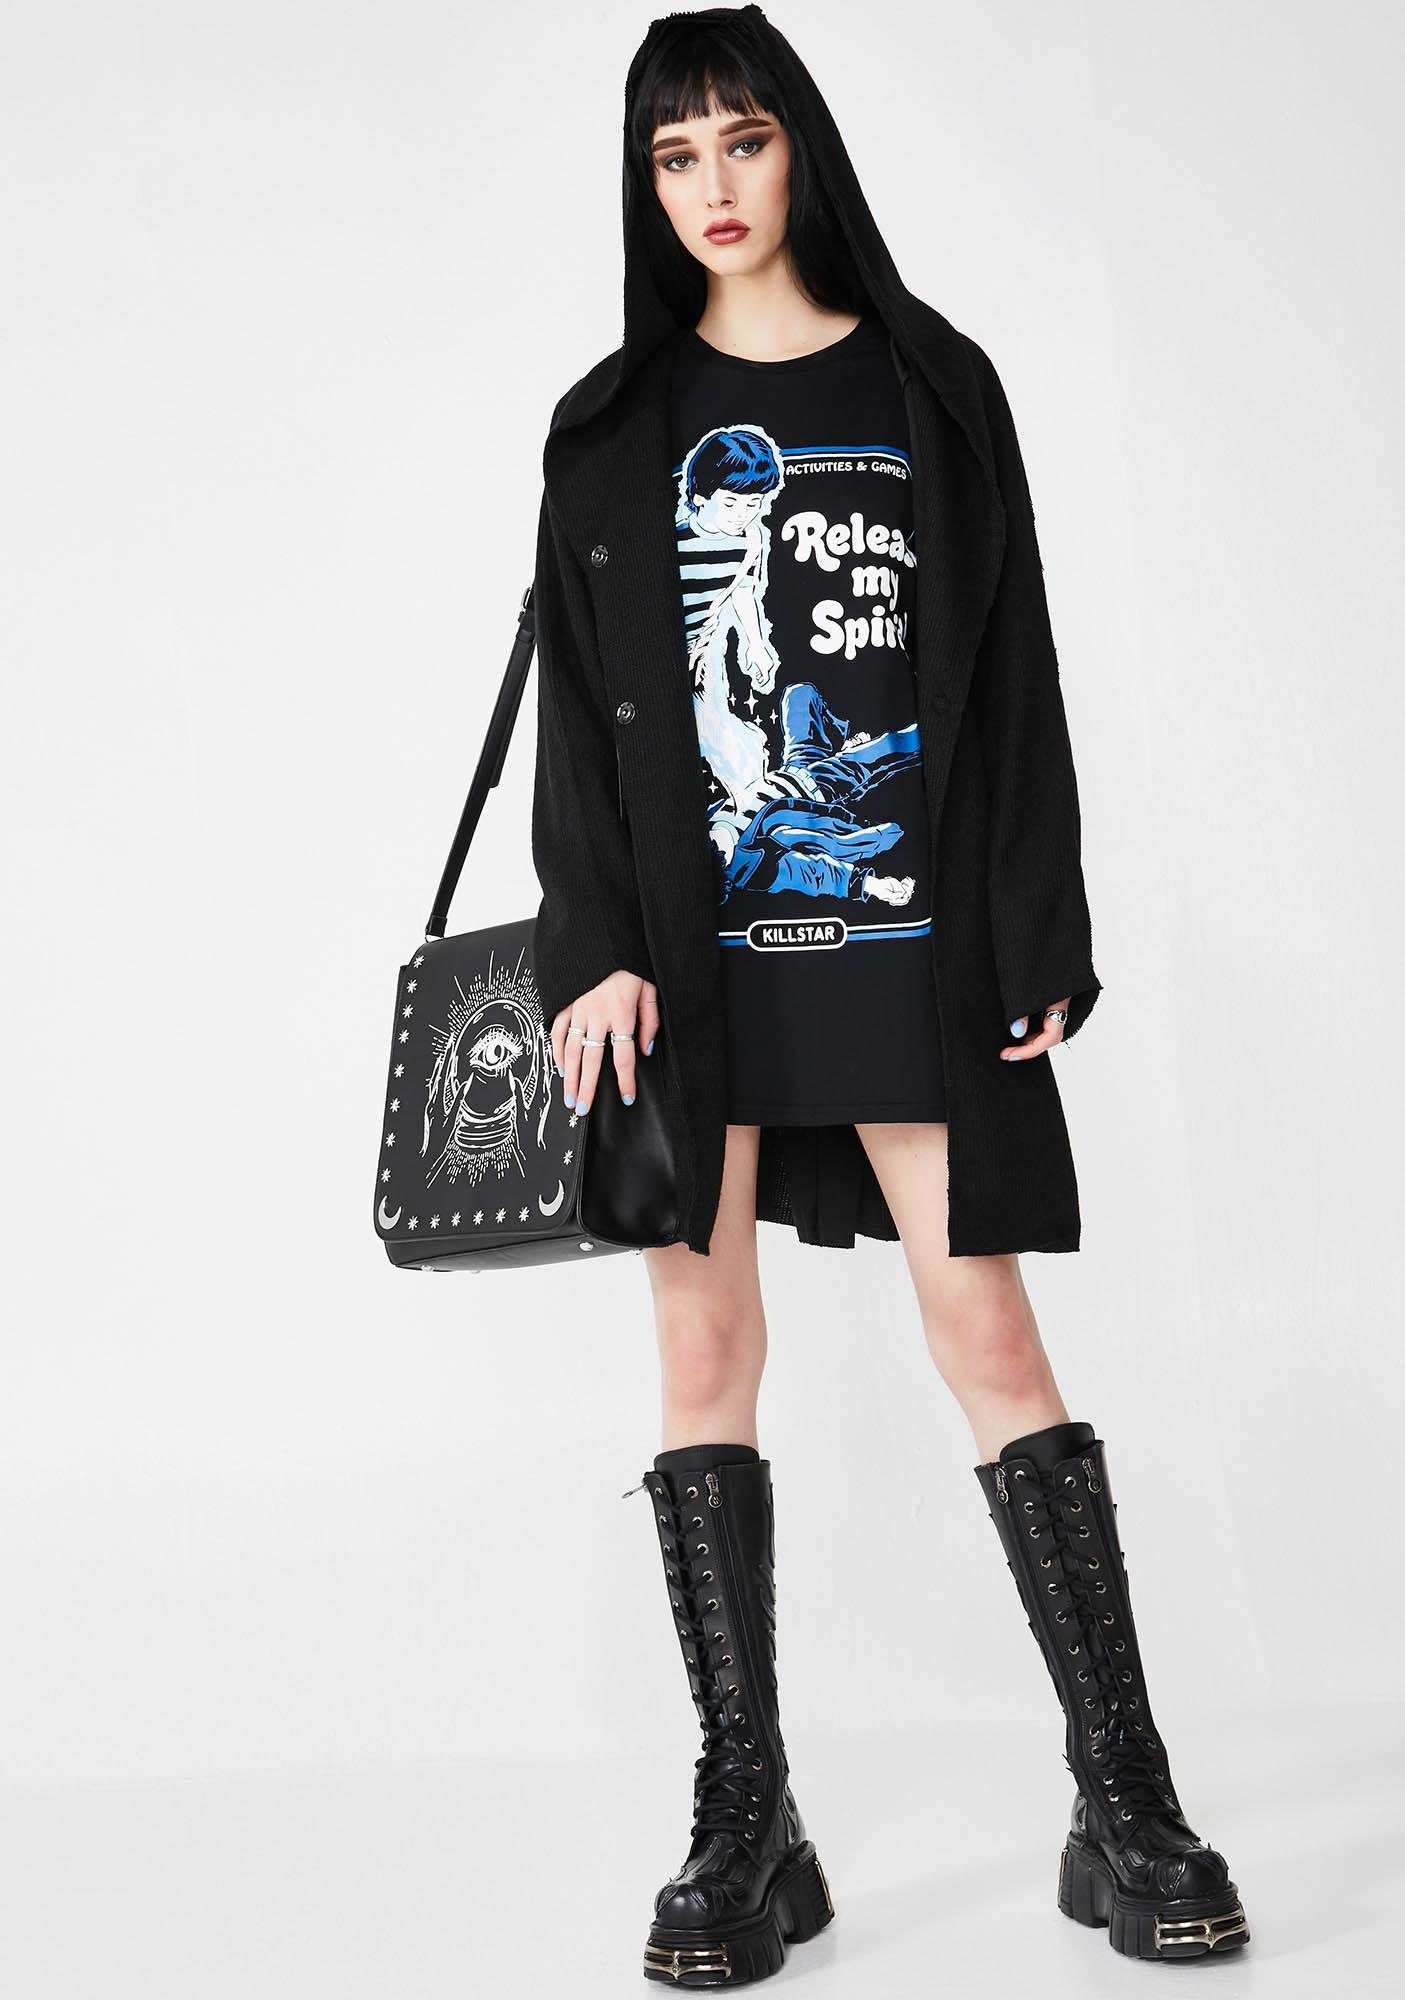 Killstar Release My Spirit T-Shirt